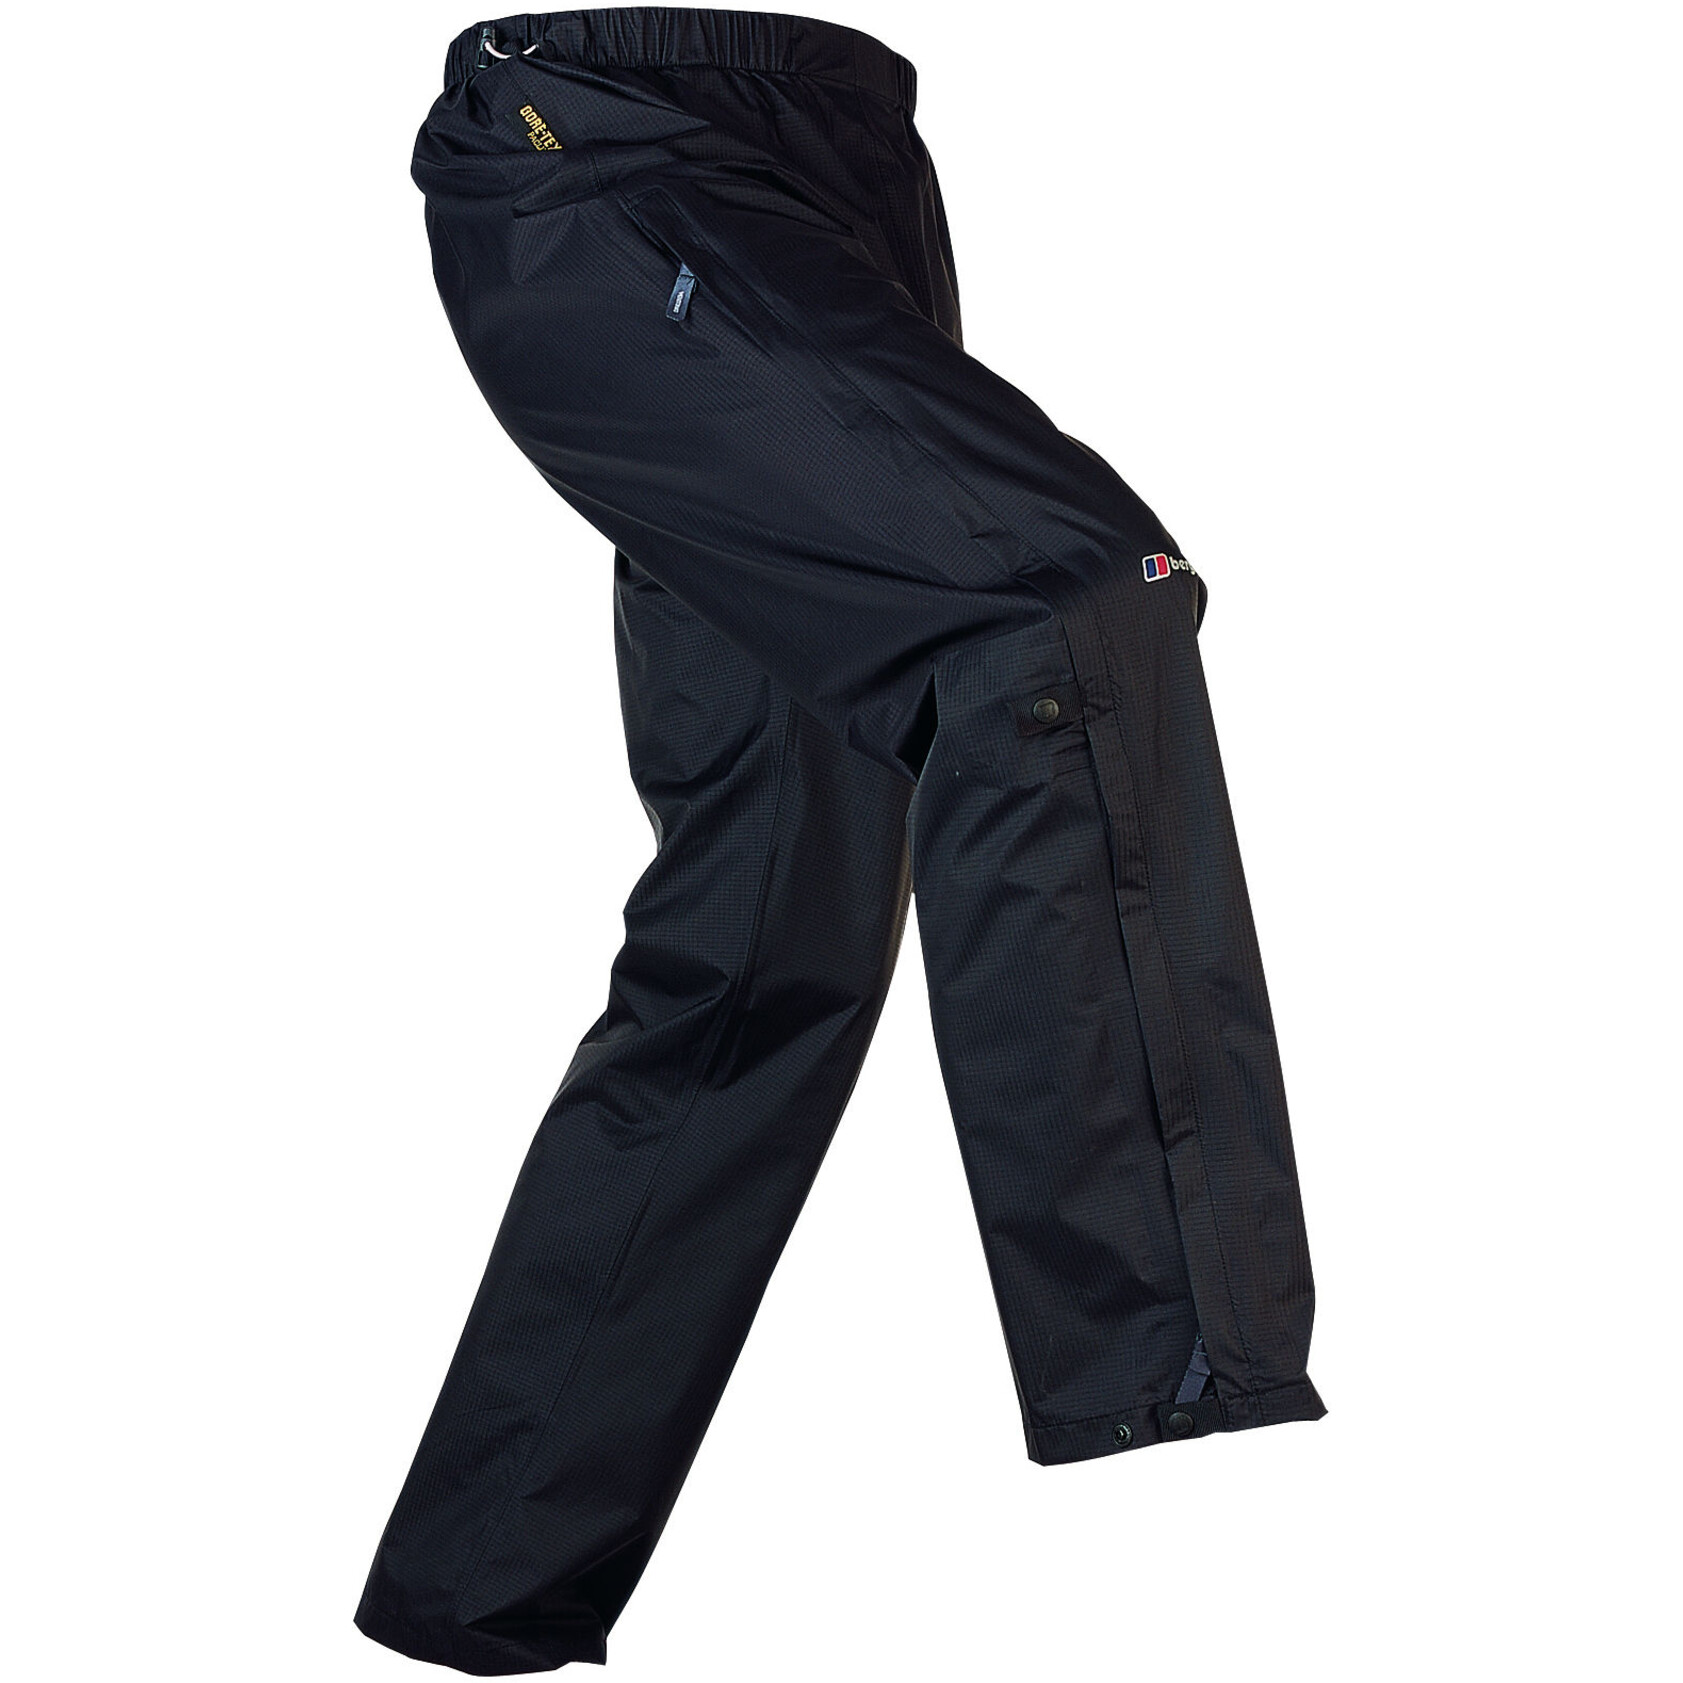 Berghaus Waterproof Trousers Size Guide - WordPress.com